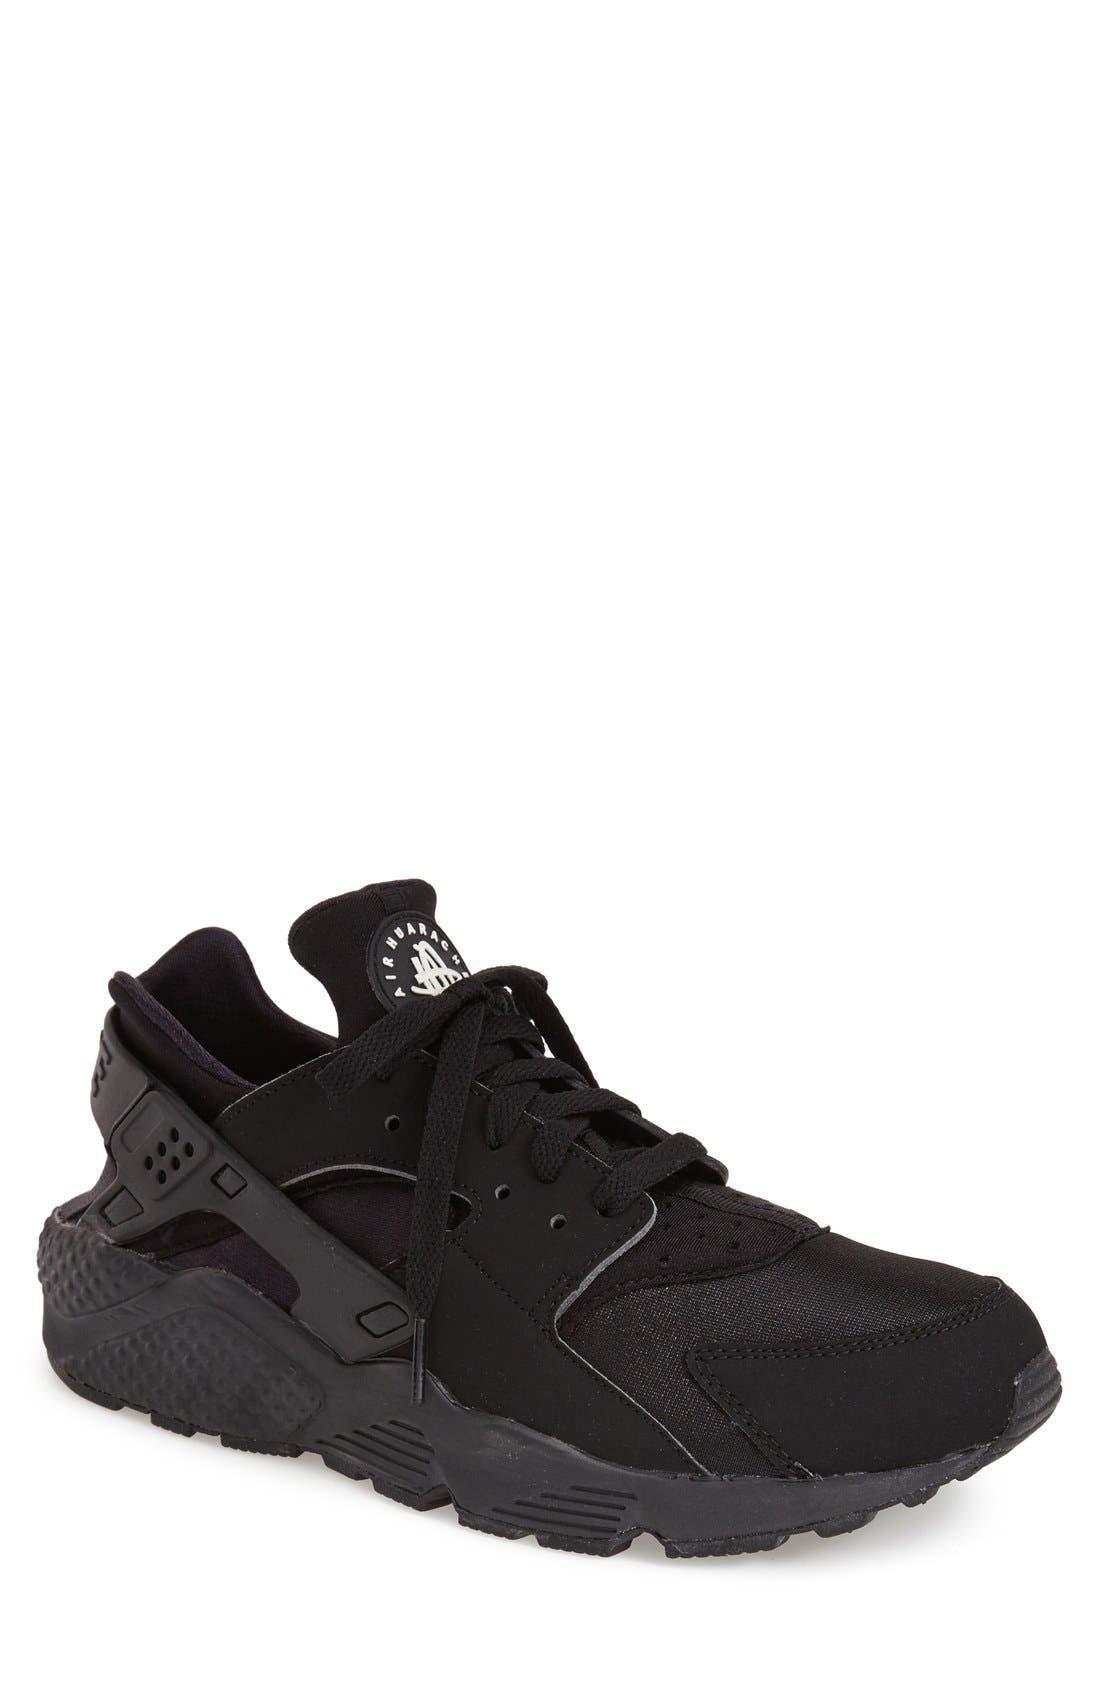 Main Image - Nike 'Air Huarache' Sneaker (Men)